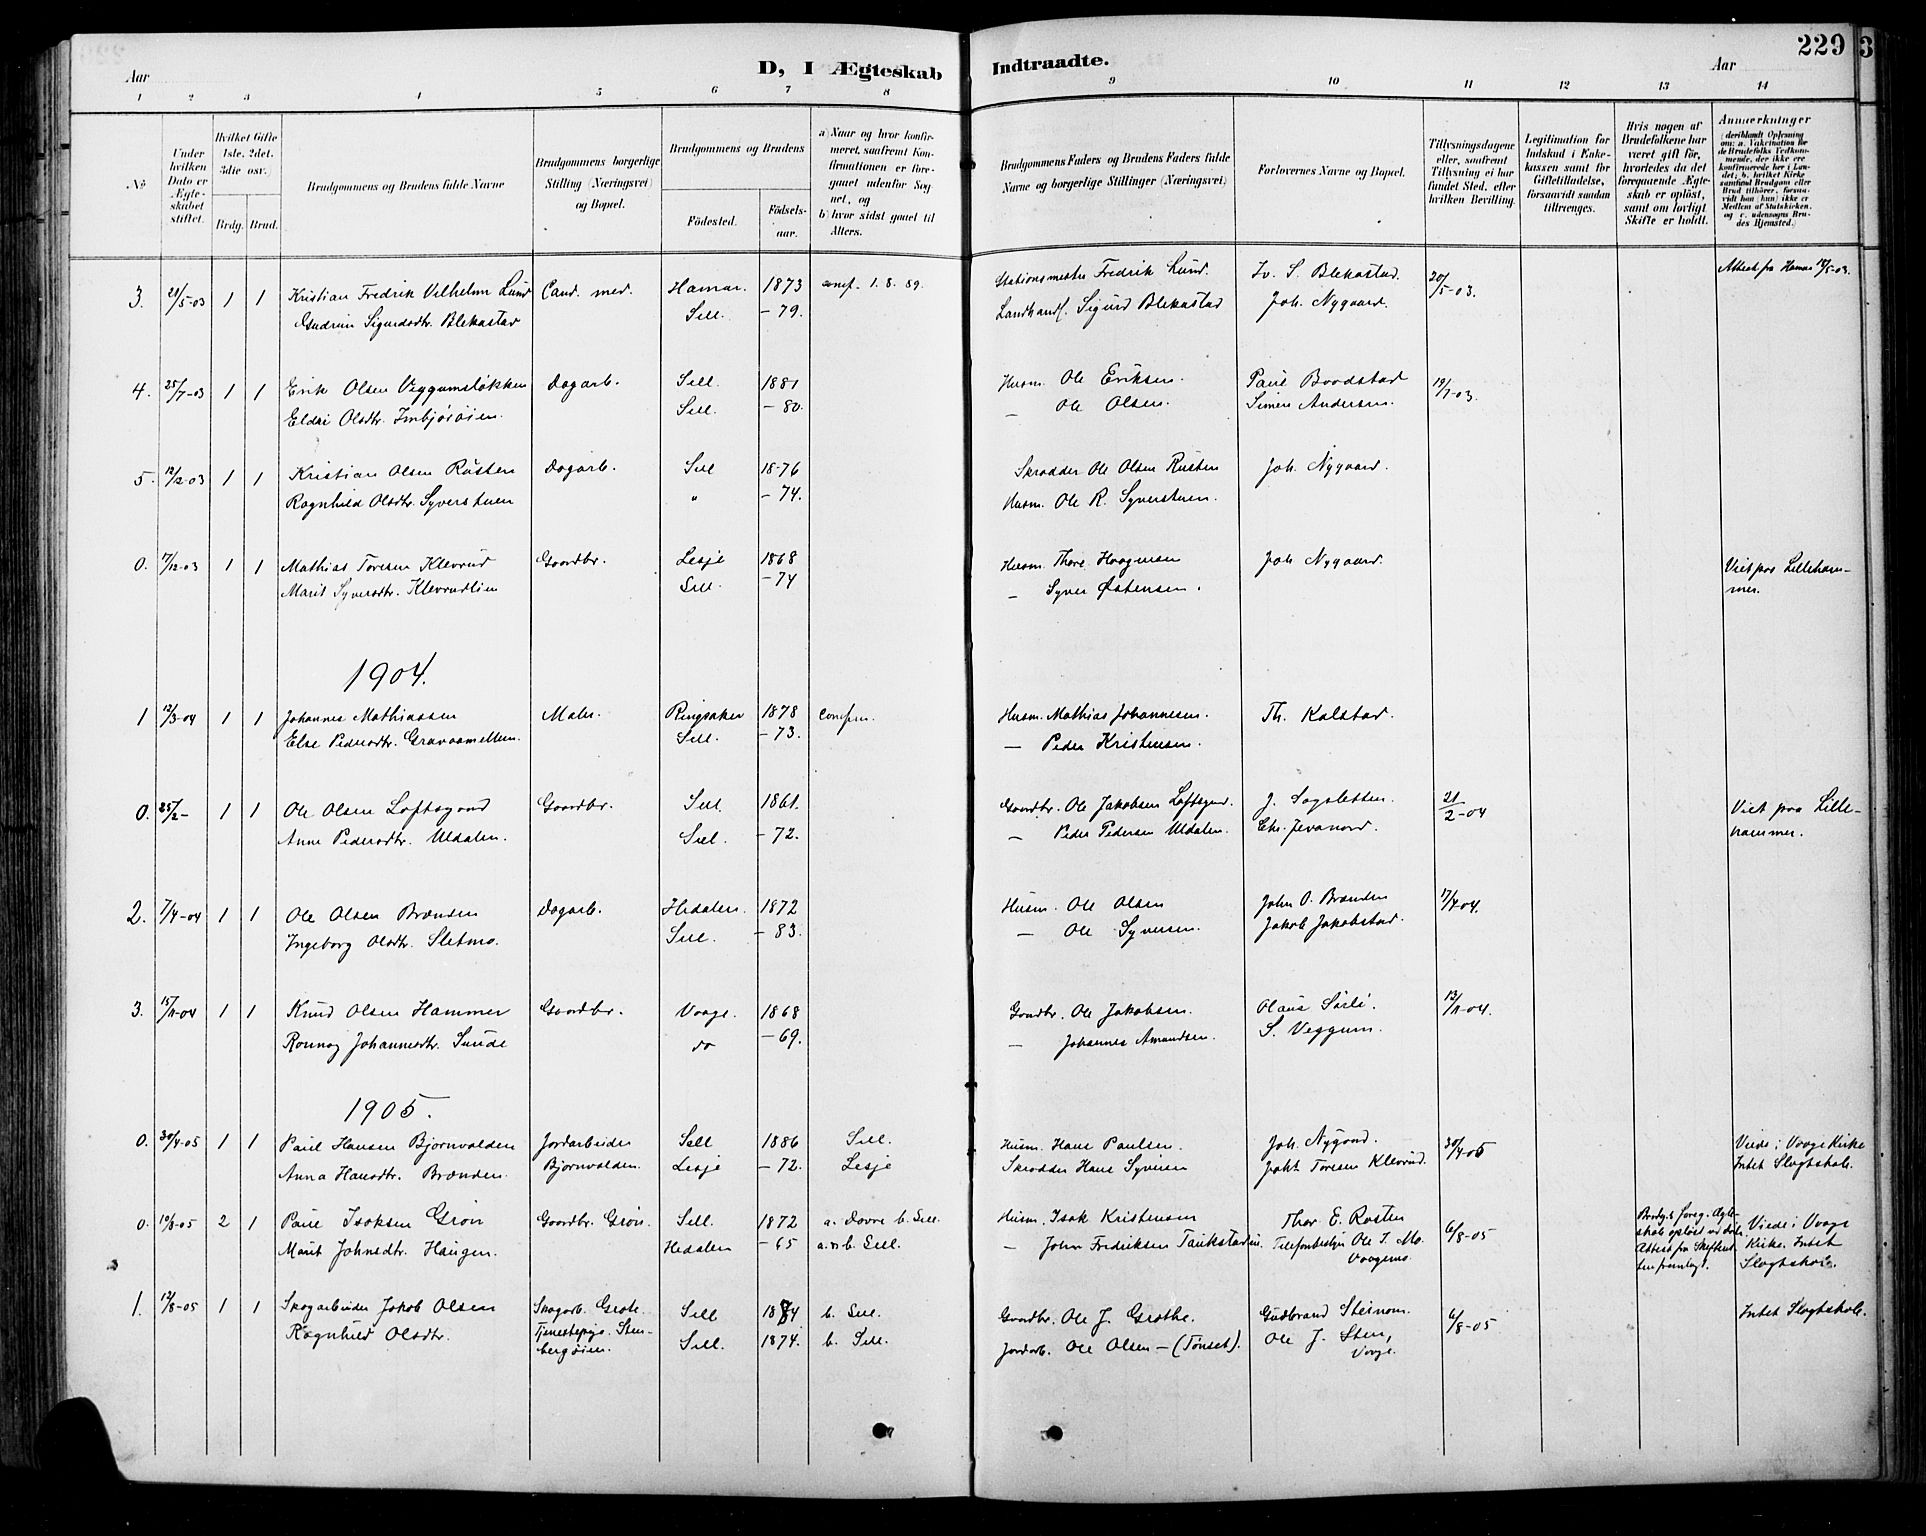 SAH, Sel prestekontor, Klokkerbok nr. 1, 1894-1923, s. 229